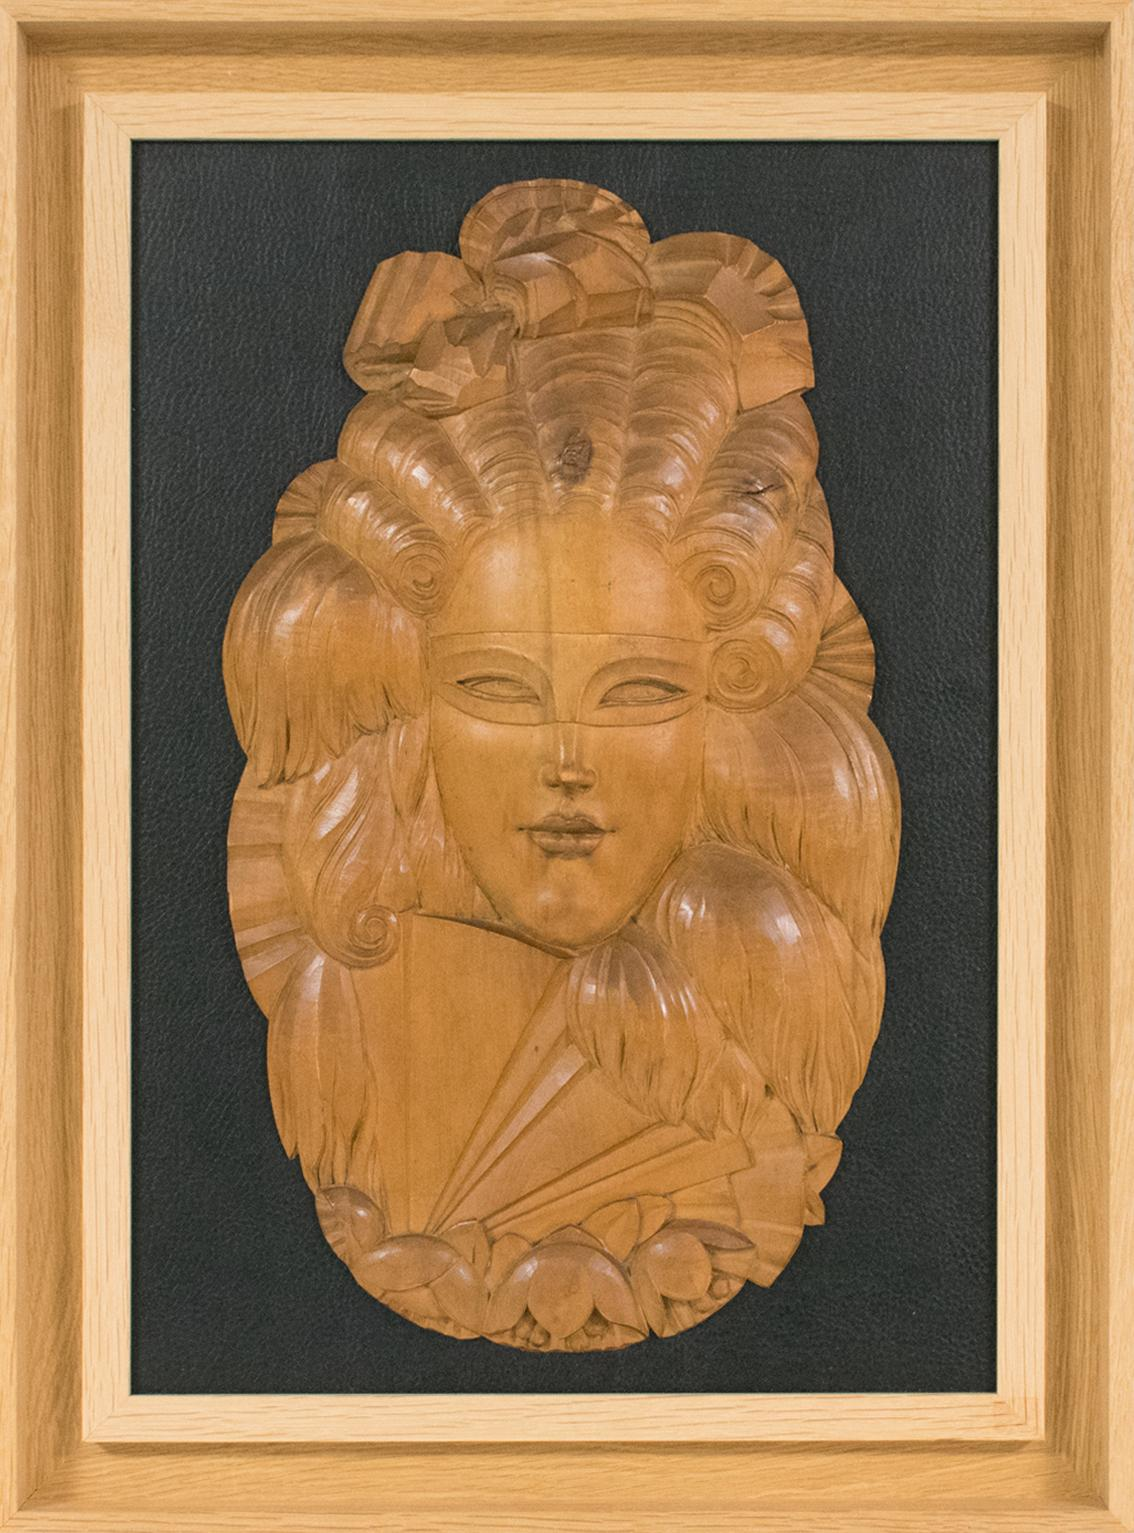 Art Deco Venetian Mask Handcrafted Wood Panel Wall Sculpture